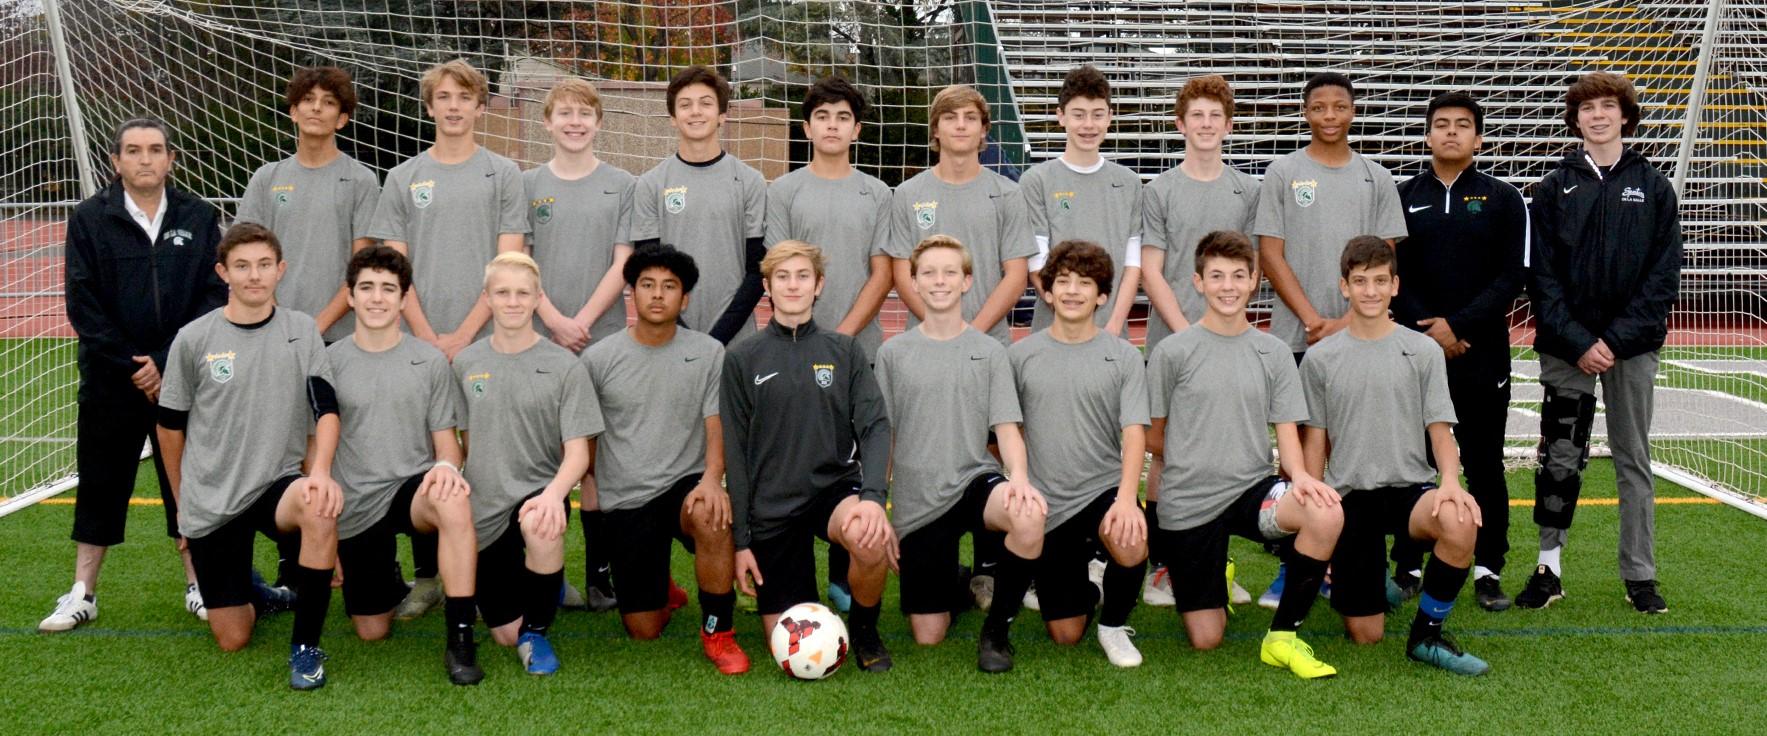 Soccer Frosh 2019-20